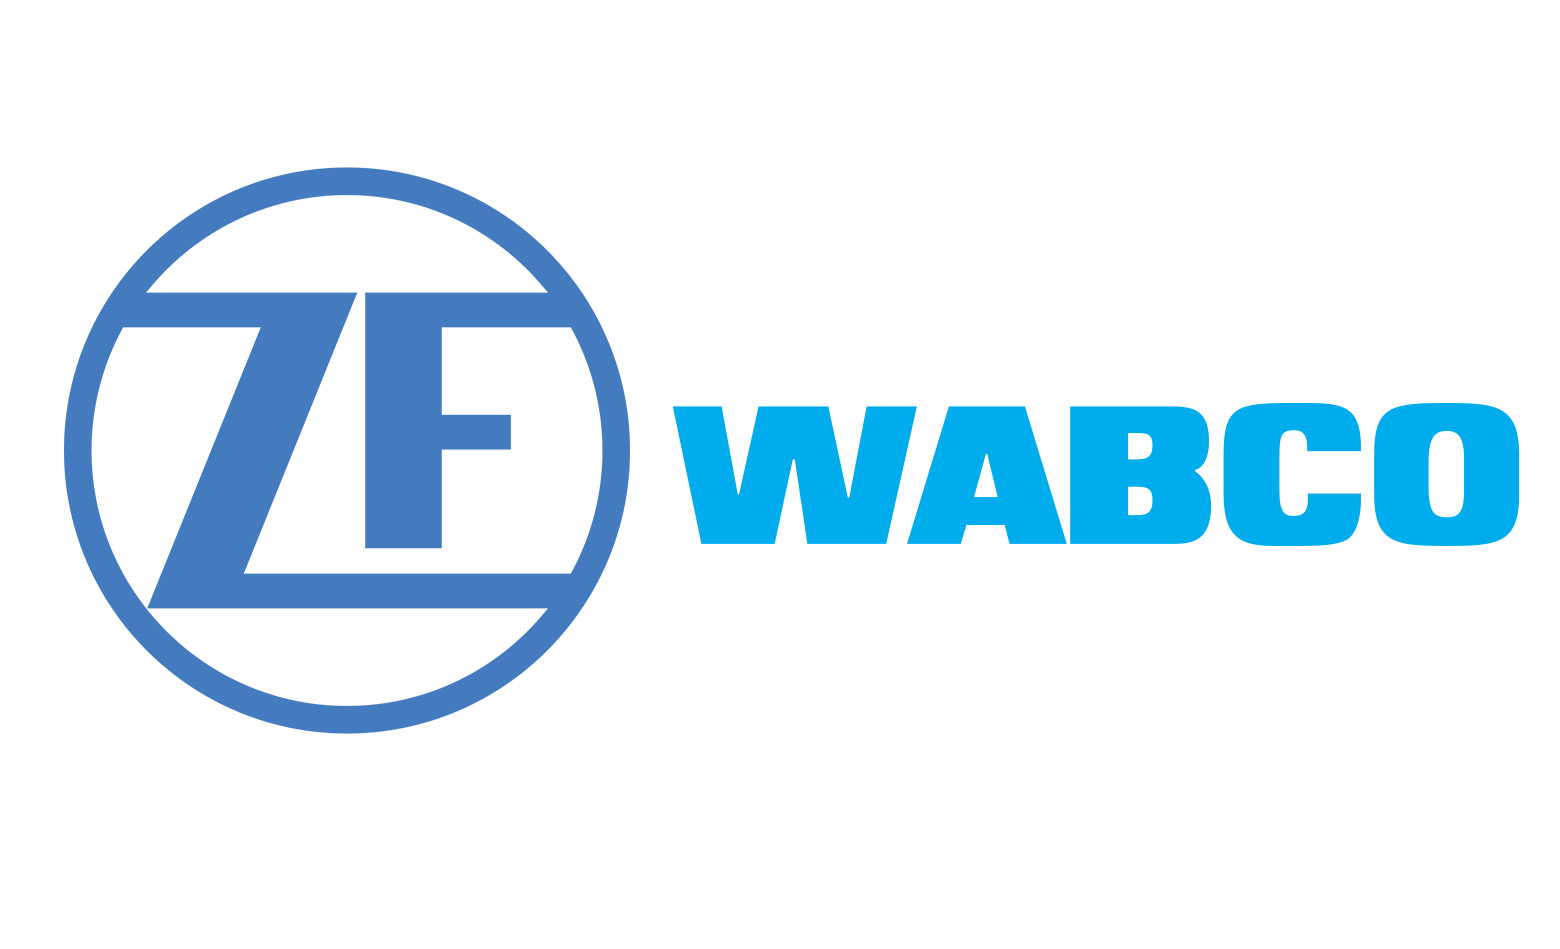 ZF preuzima WABCO za 7 milijardi dolara